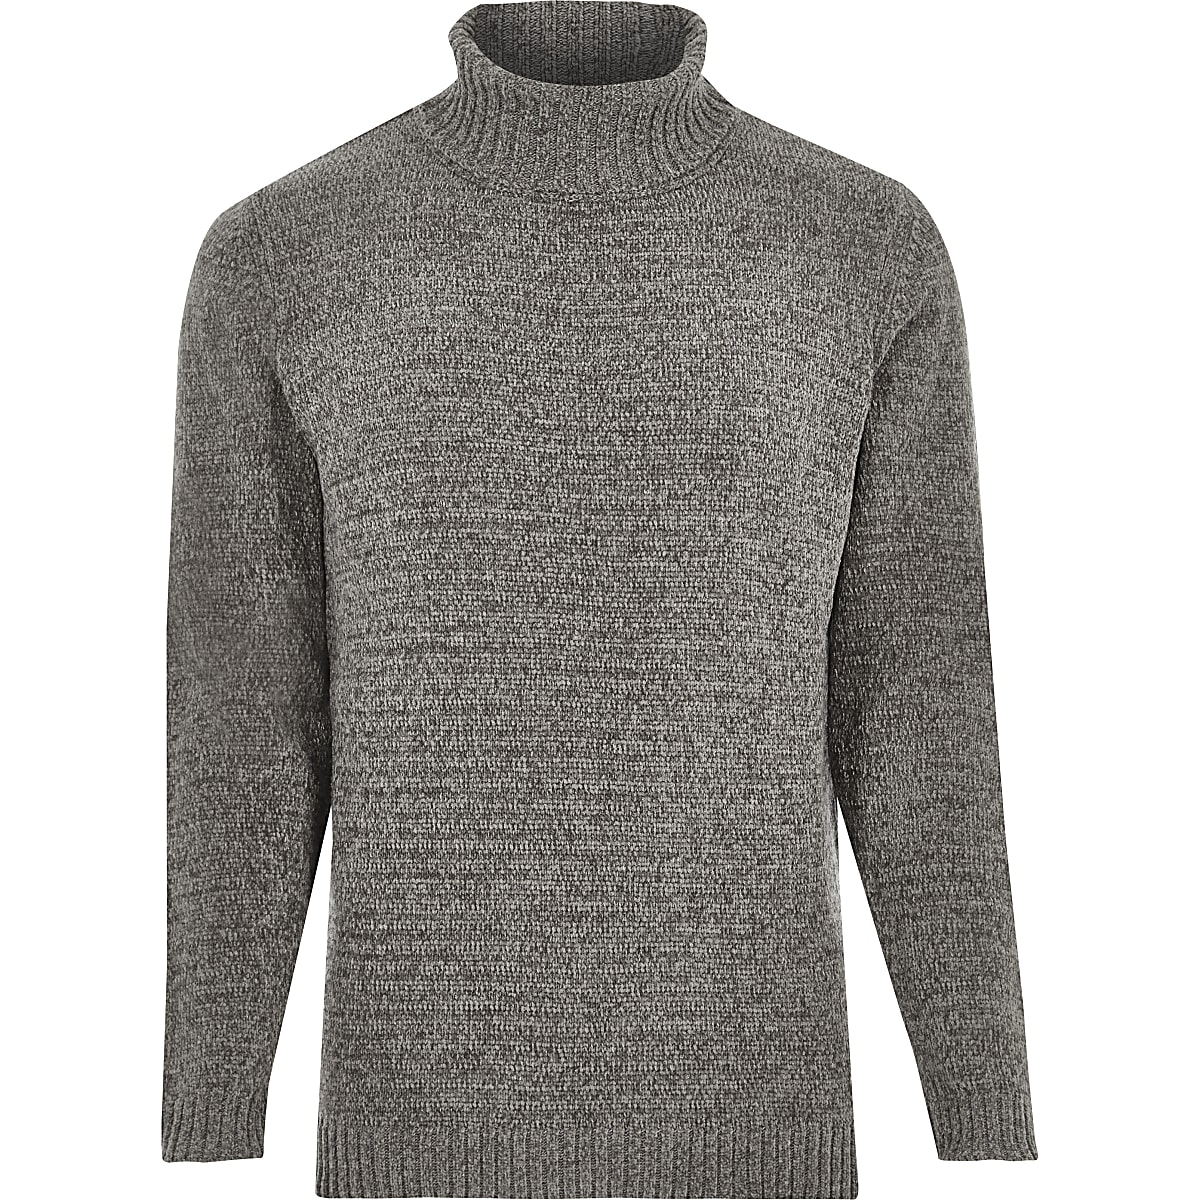 Grey soft roll neck sweater